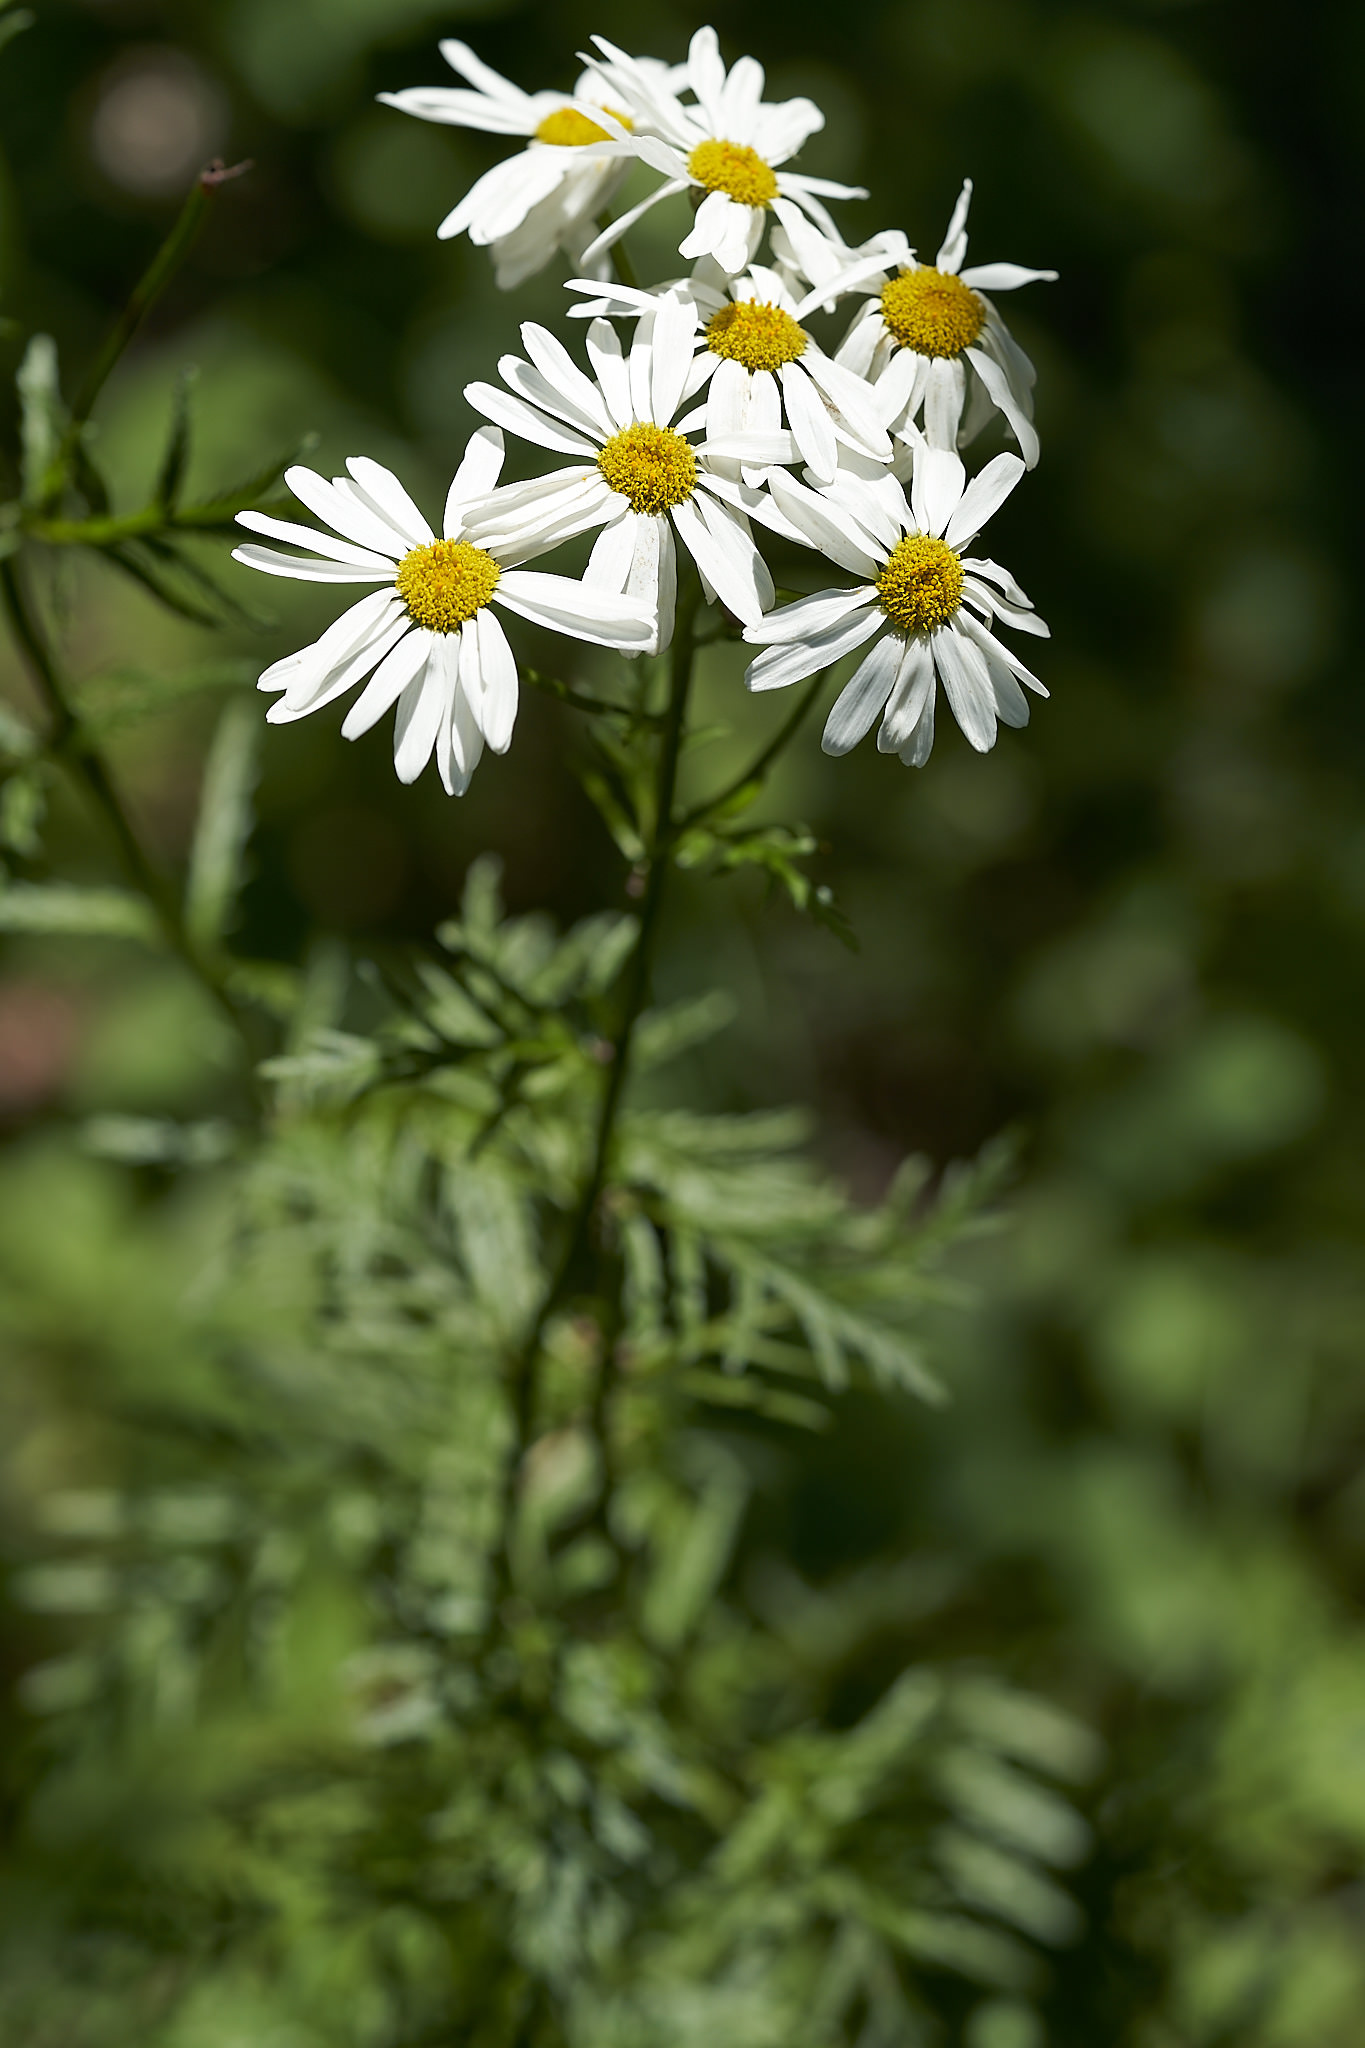 Straussblütige Margerite (Tanacetum corymbosum)